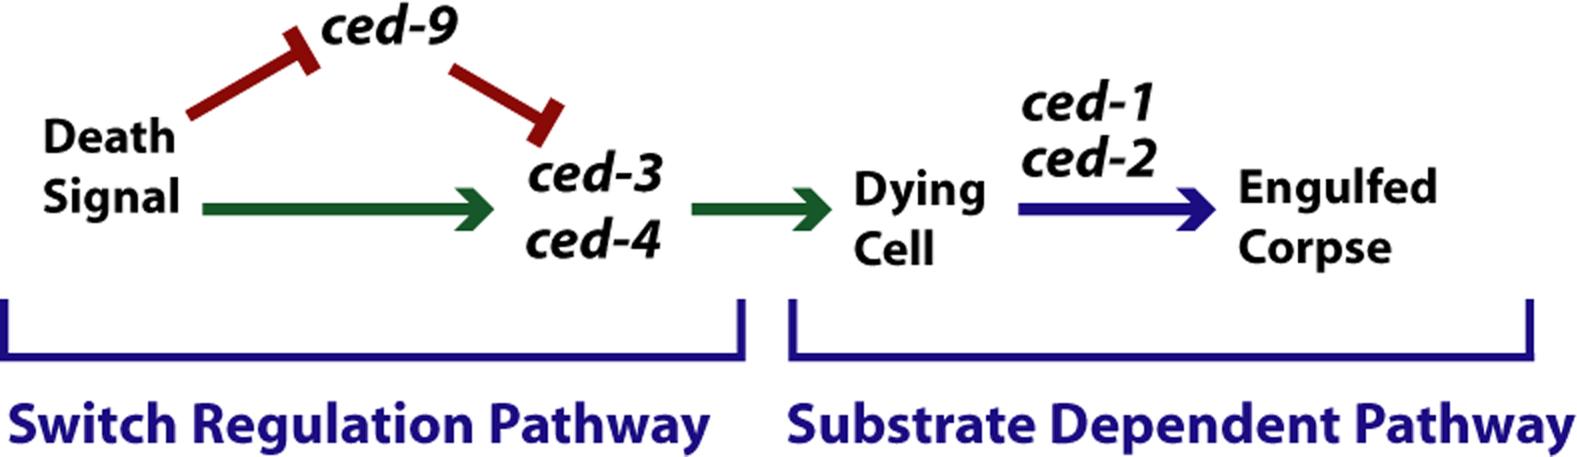 Genetic dissection of developmental pathways